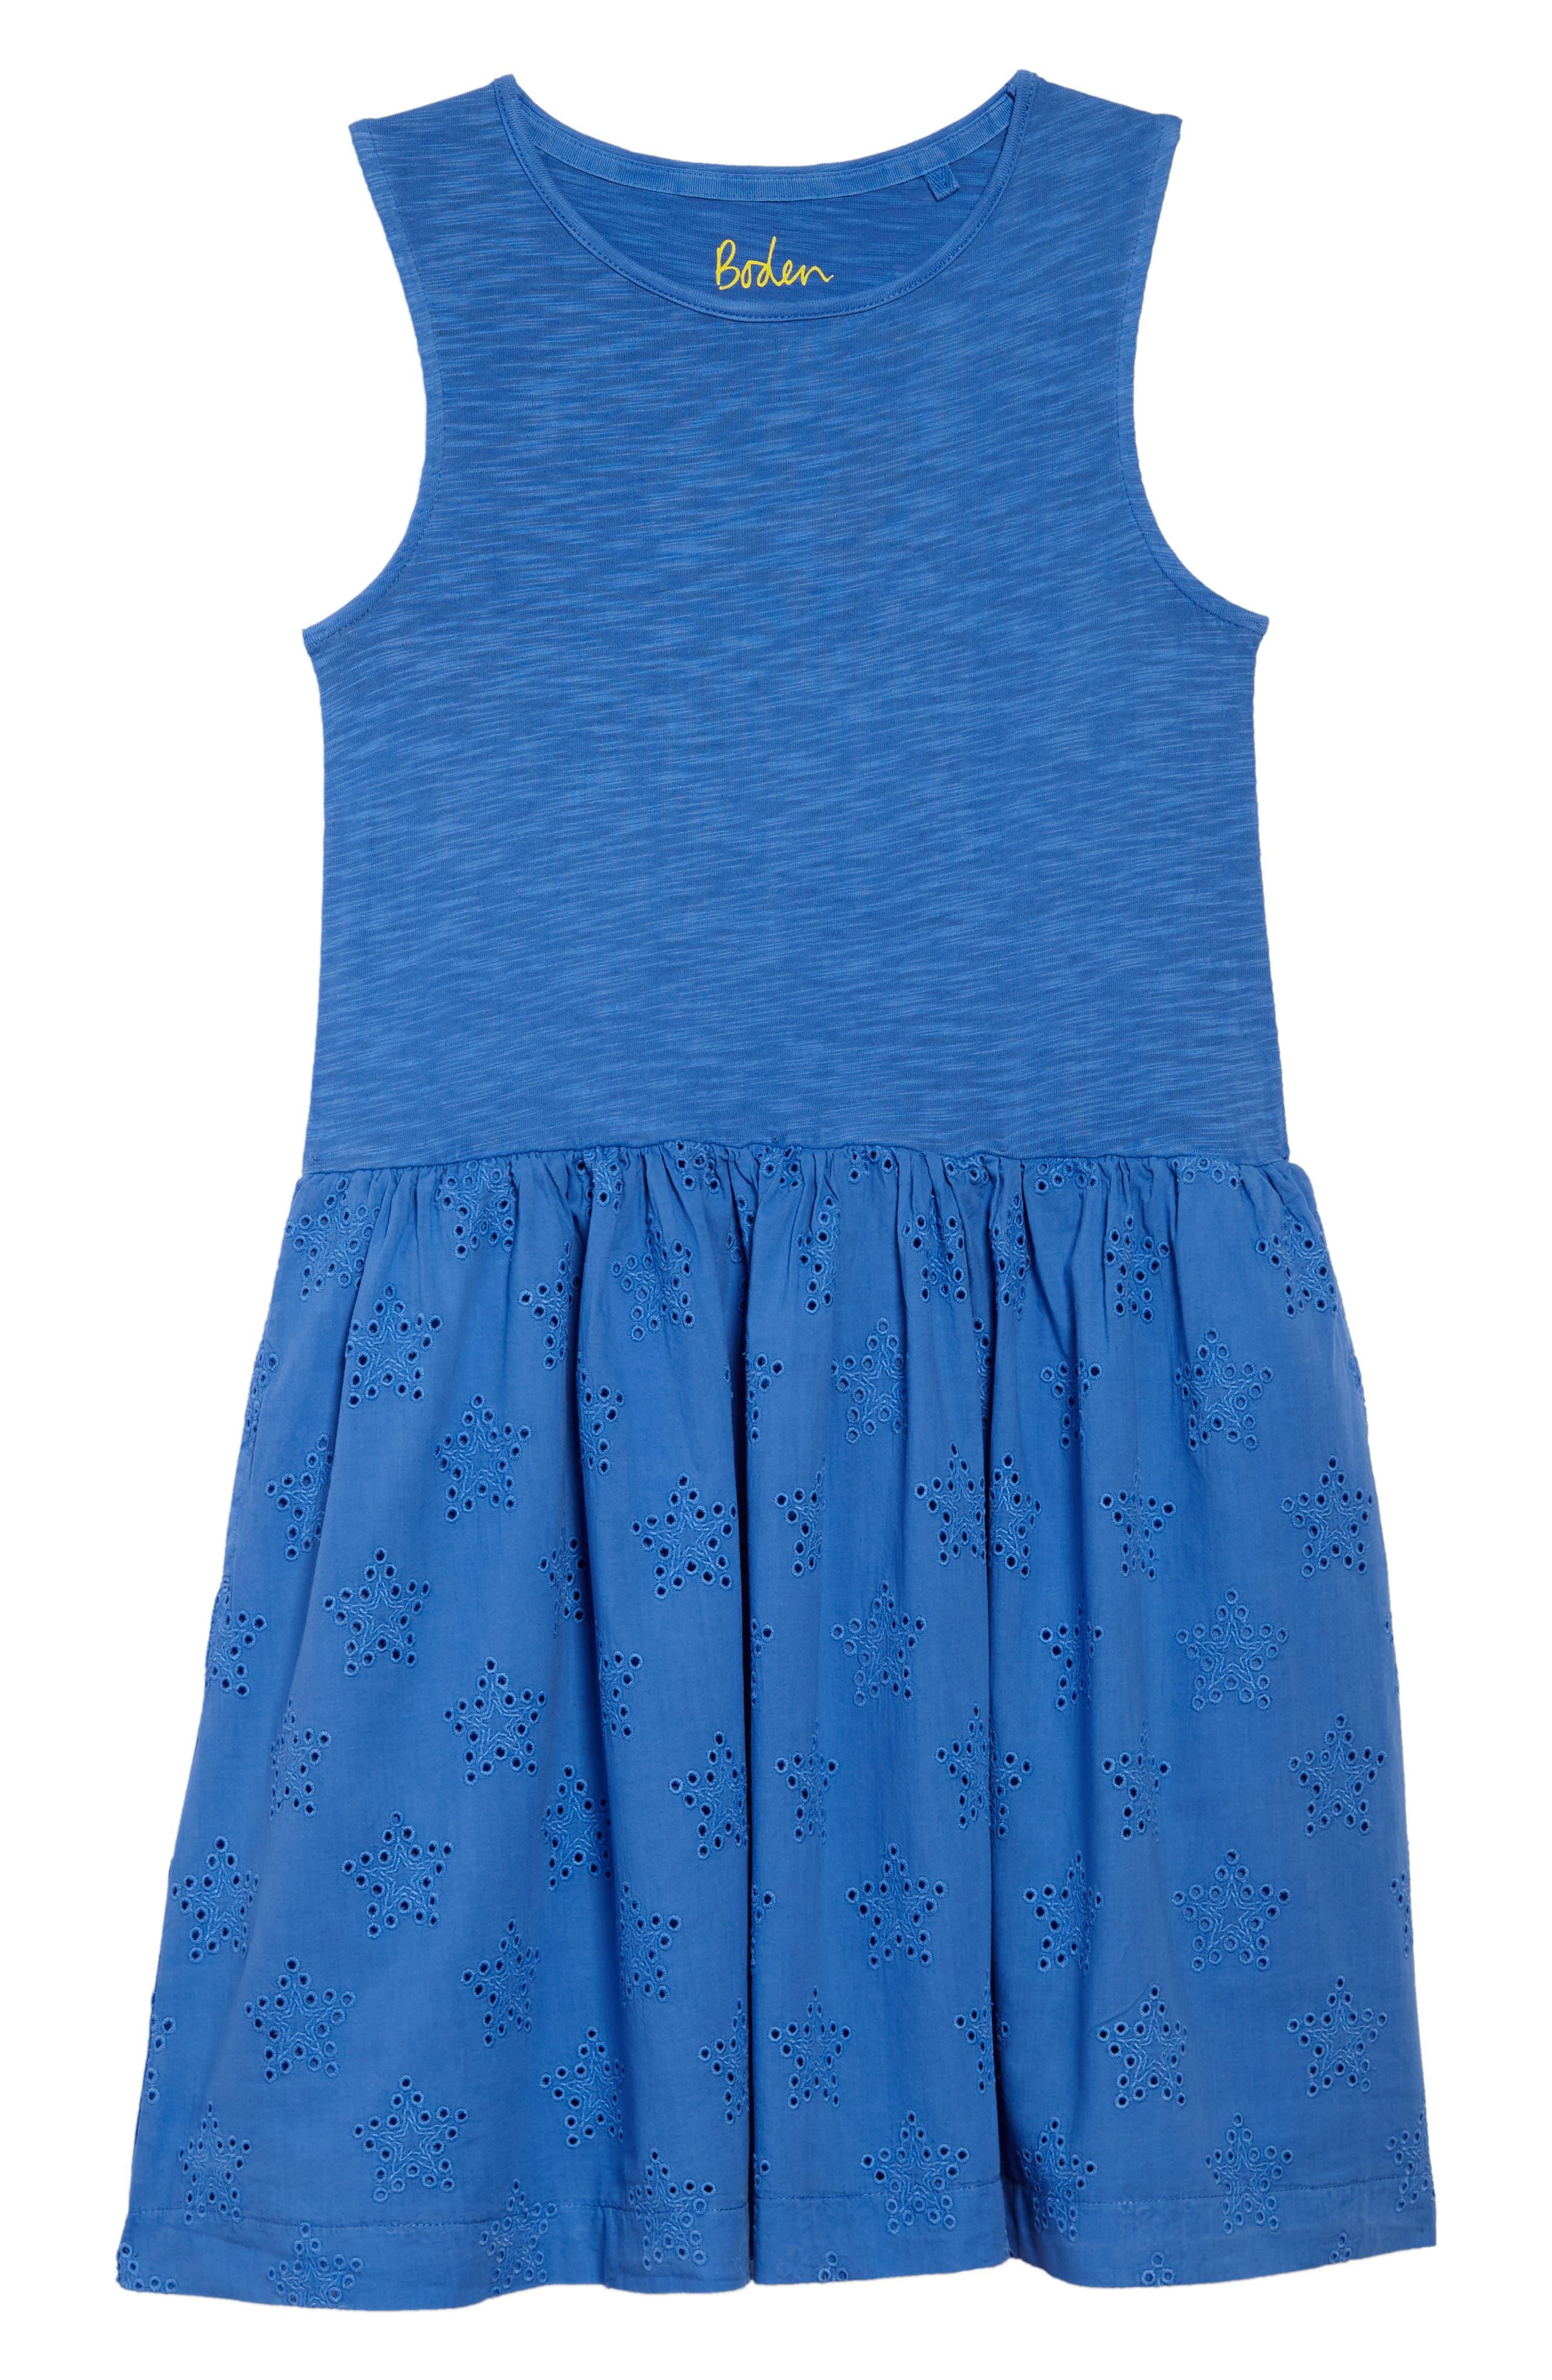 MINI BODEN,                             Eyelet Dress,                             Main thumbnail 1, color,                             424